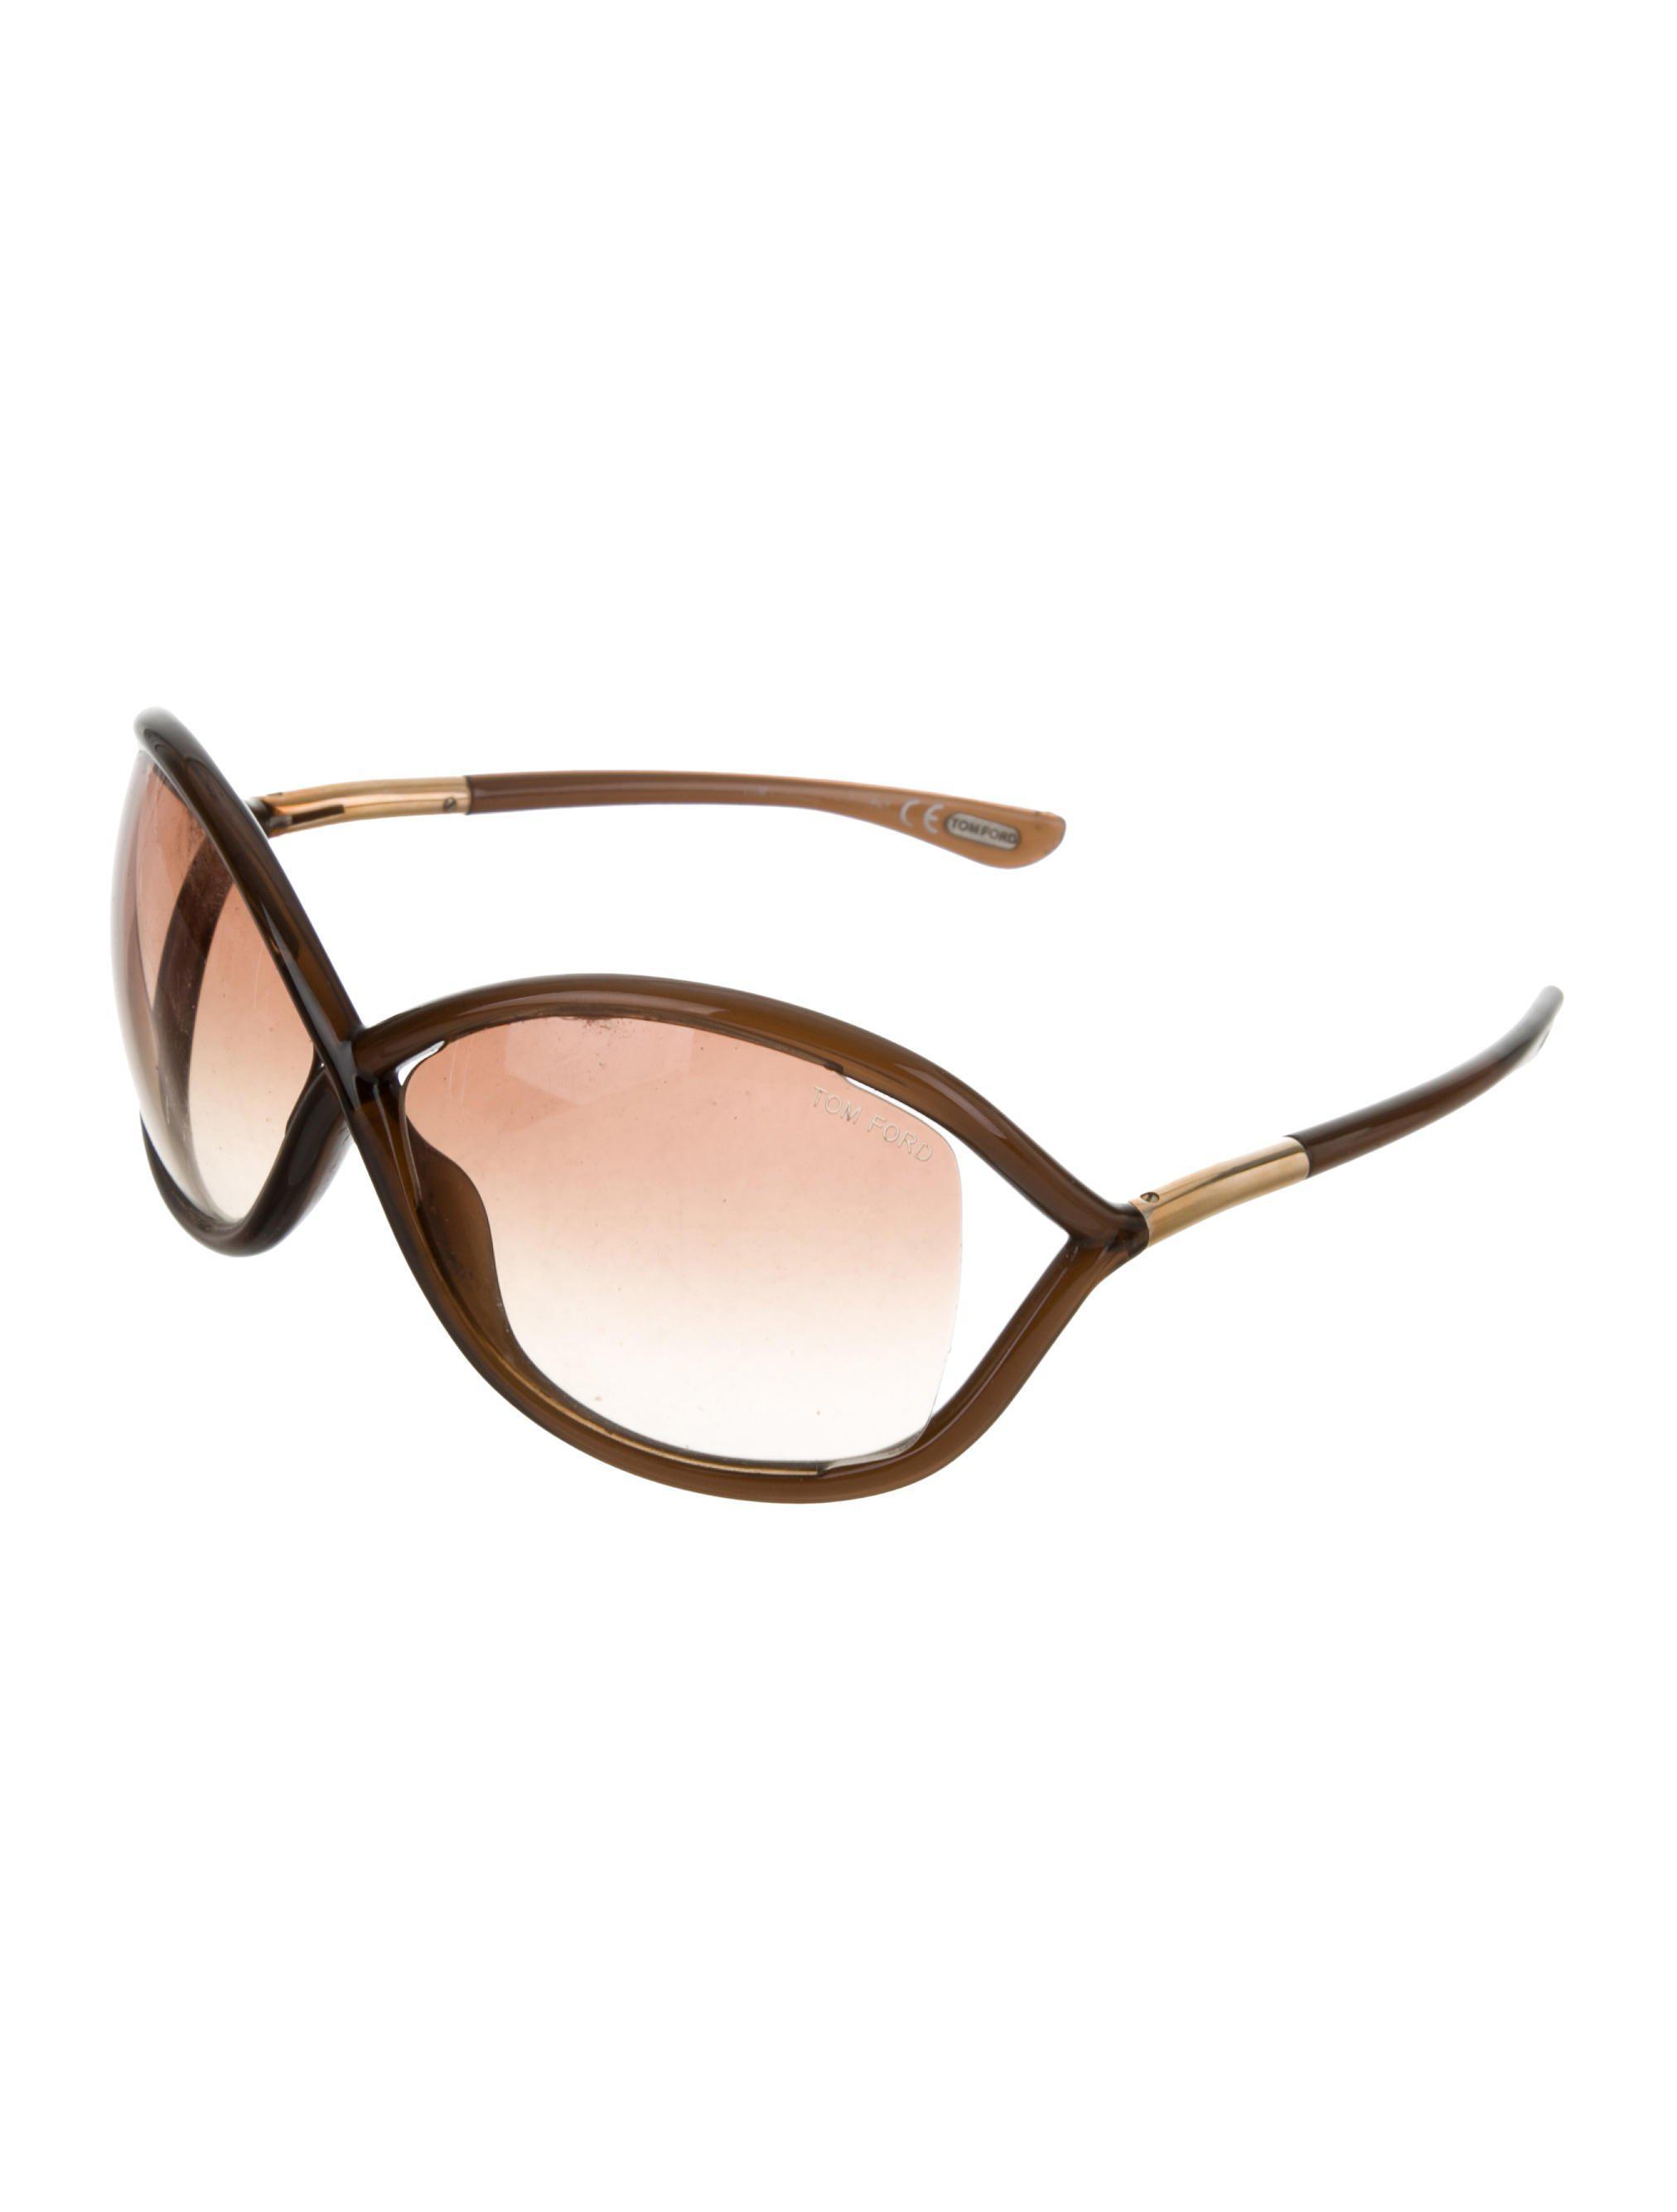 b104907b33 Lyst - Tom Ford Whitney Gradient Sunglasses Transparent in Metallic